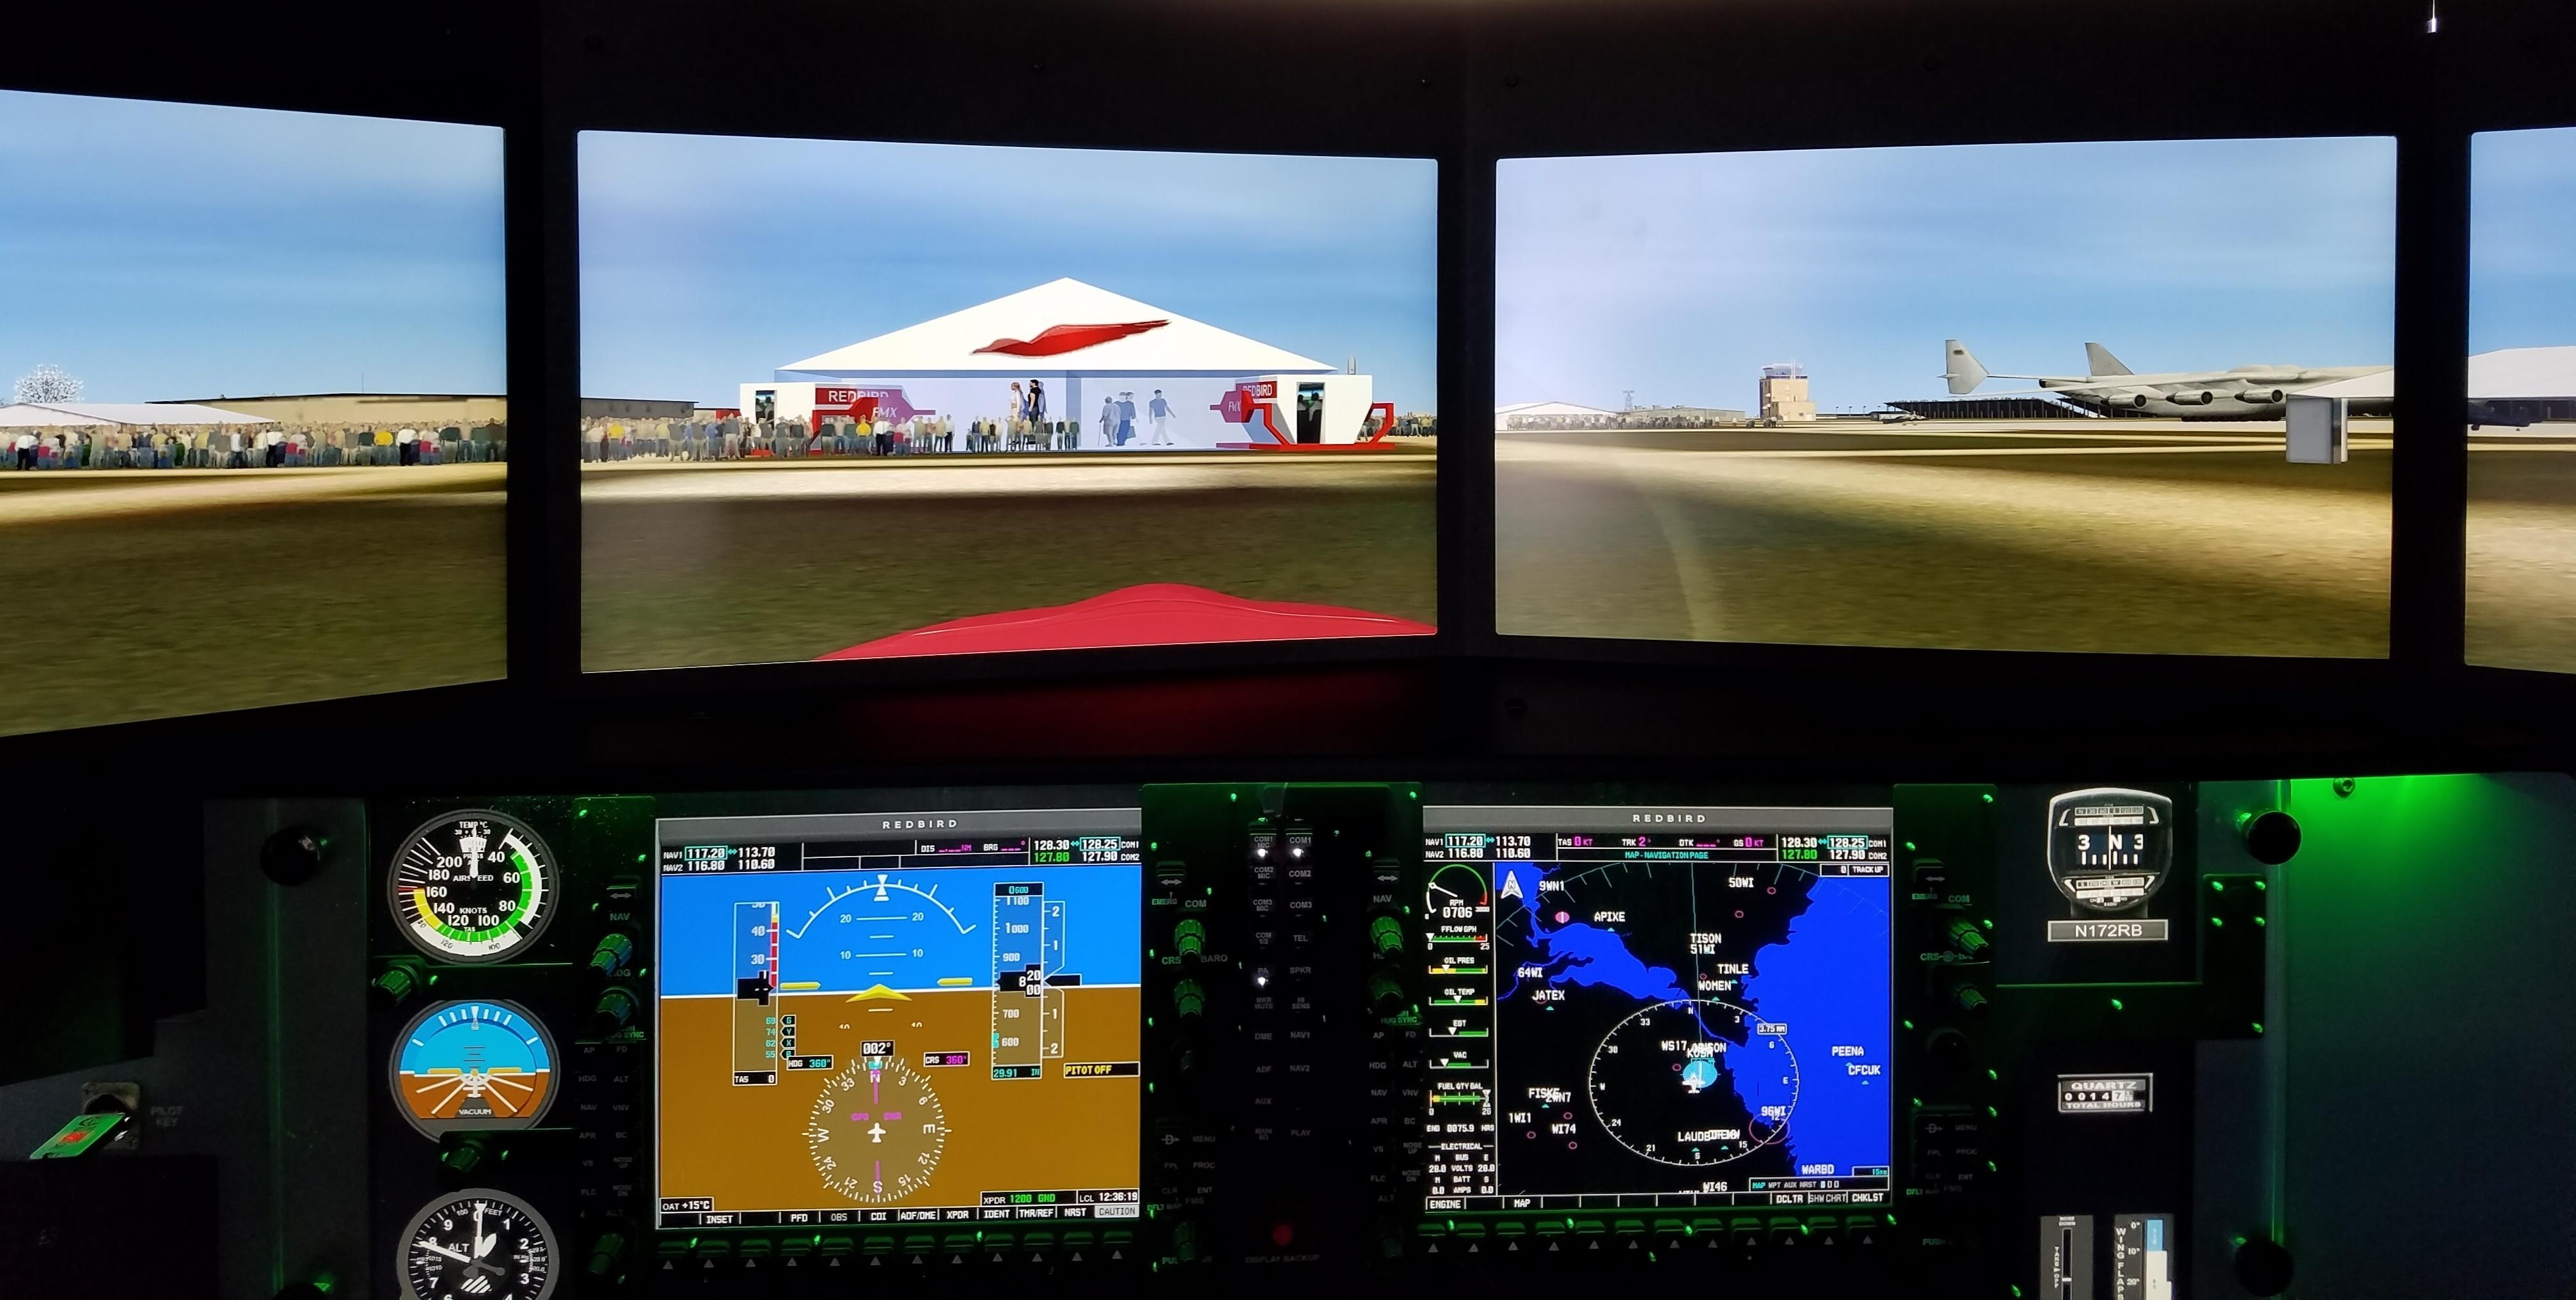 Redbird Heads to The World's Greatest Aviation Celebration